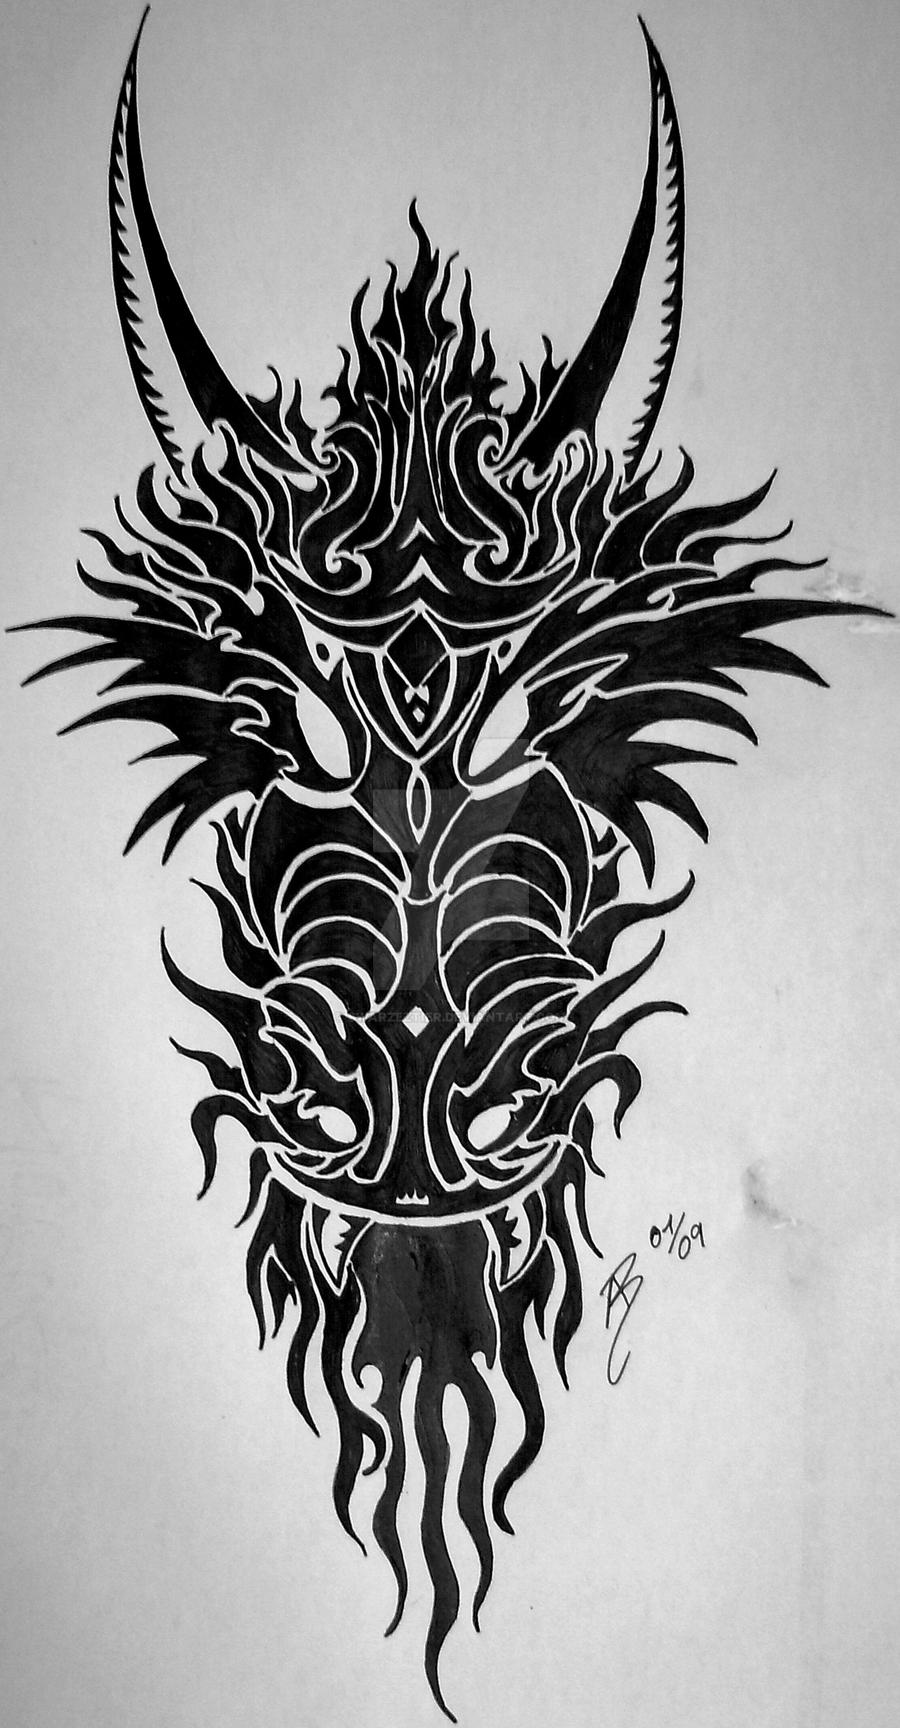 dragon head tribal by swarzeztier on deviantart. Black Bedroom Furniture Sets. Home Design Ideas